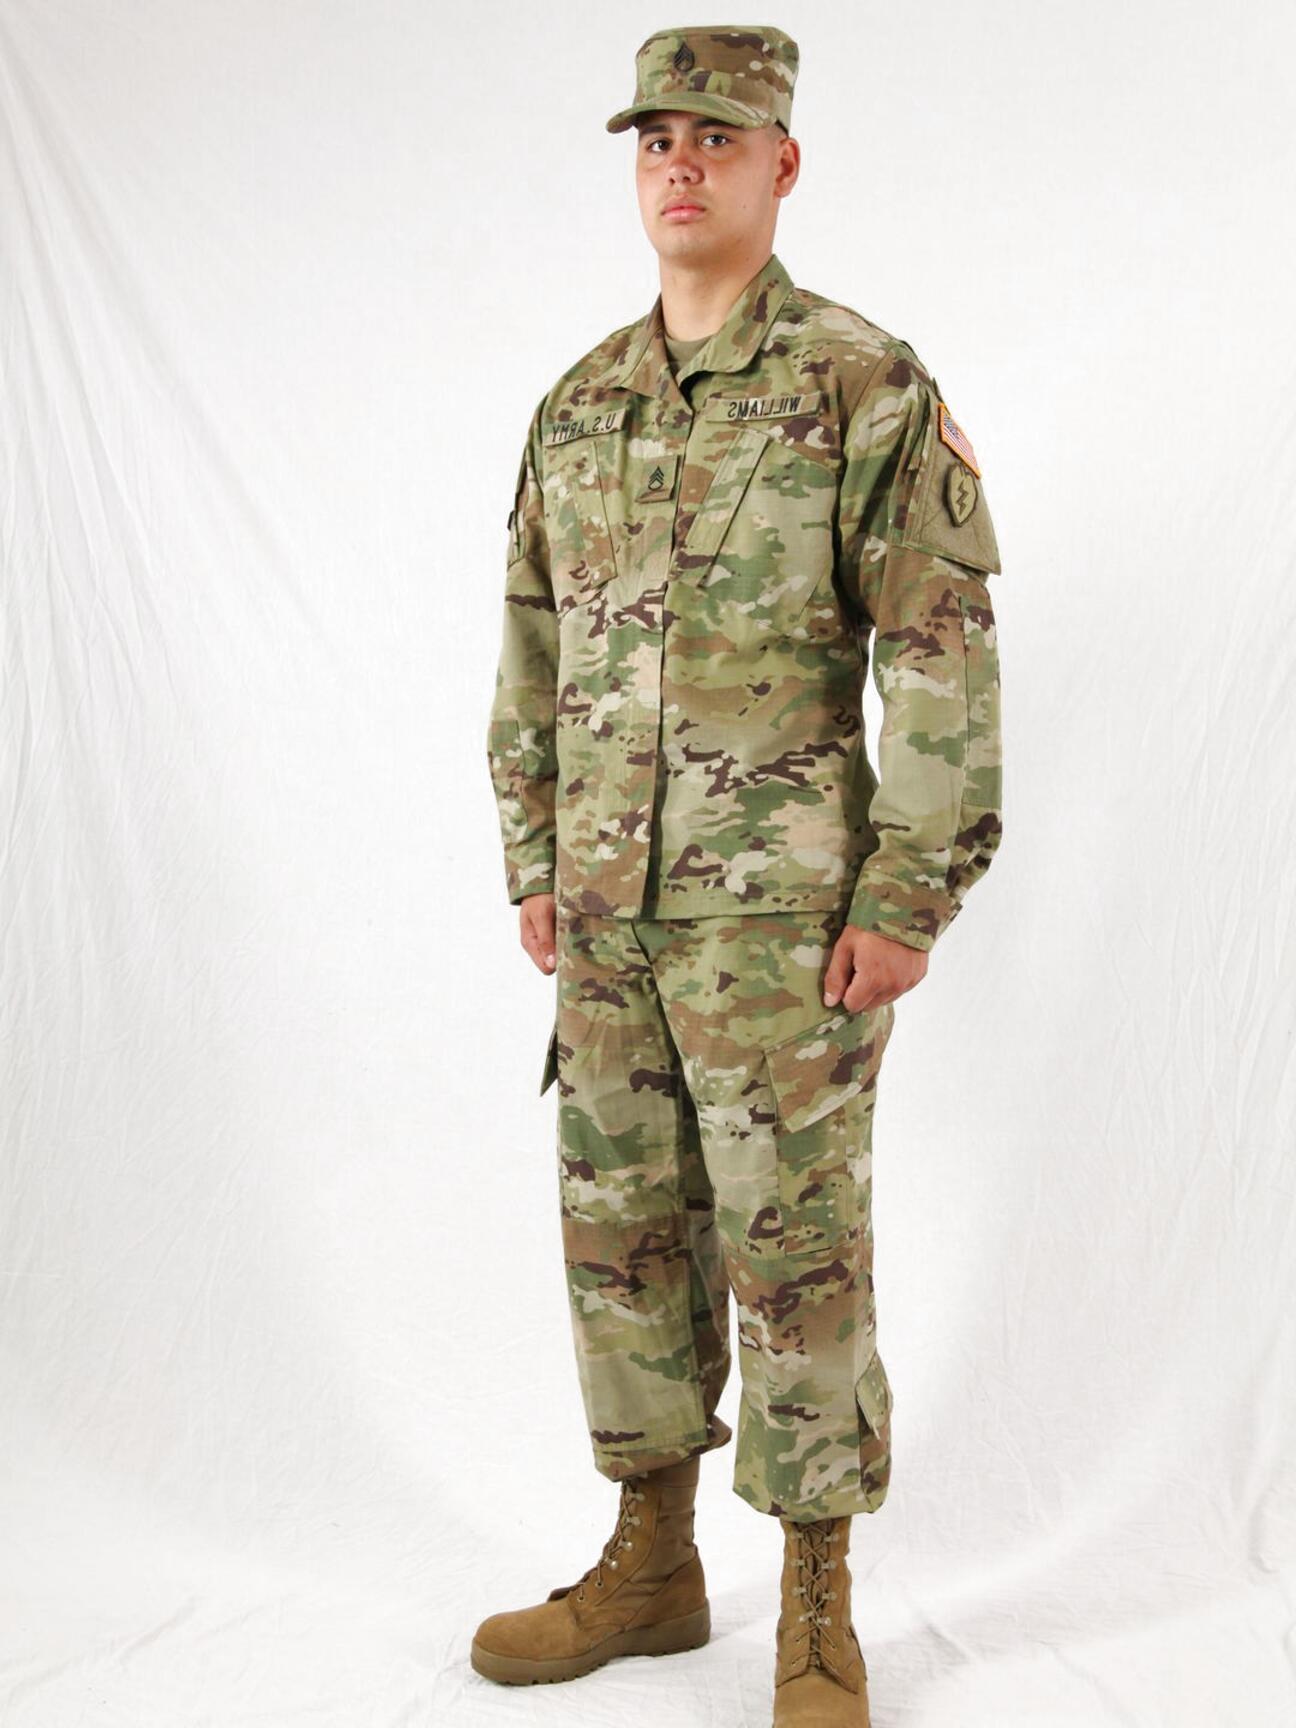 army uniform for sale